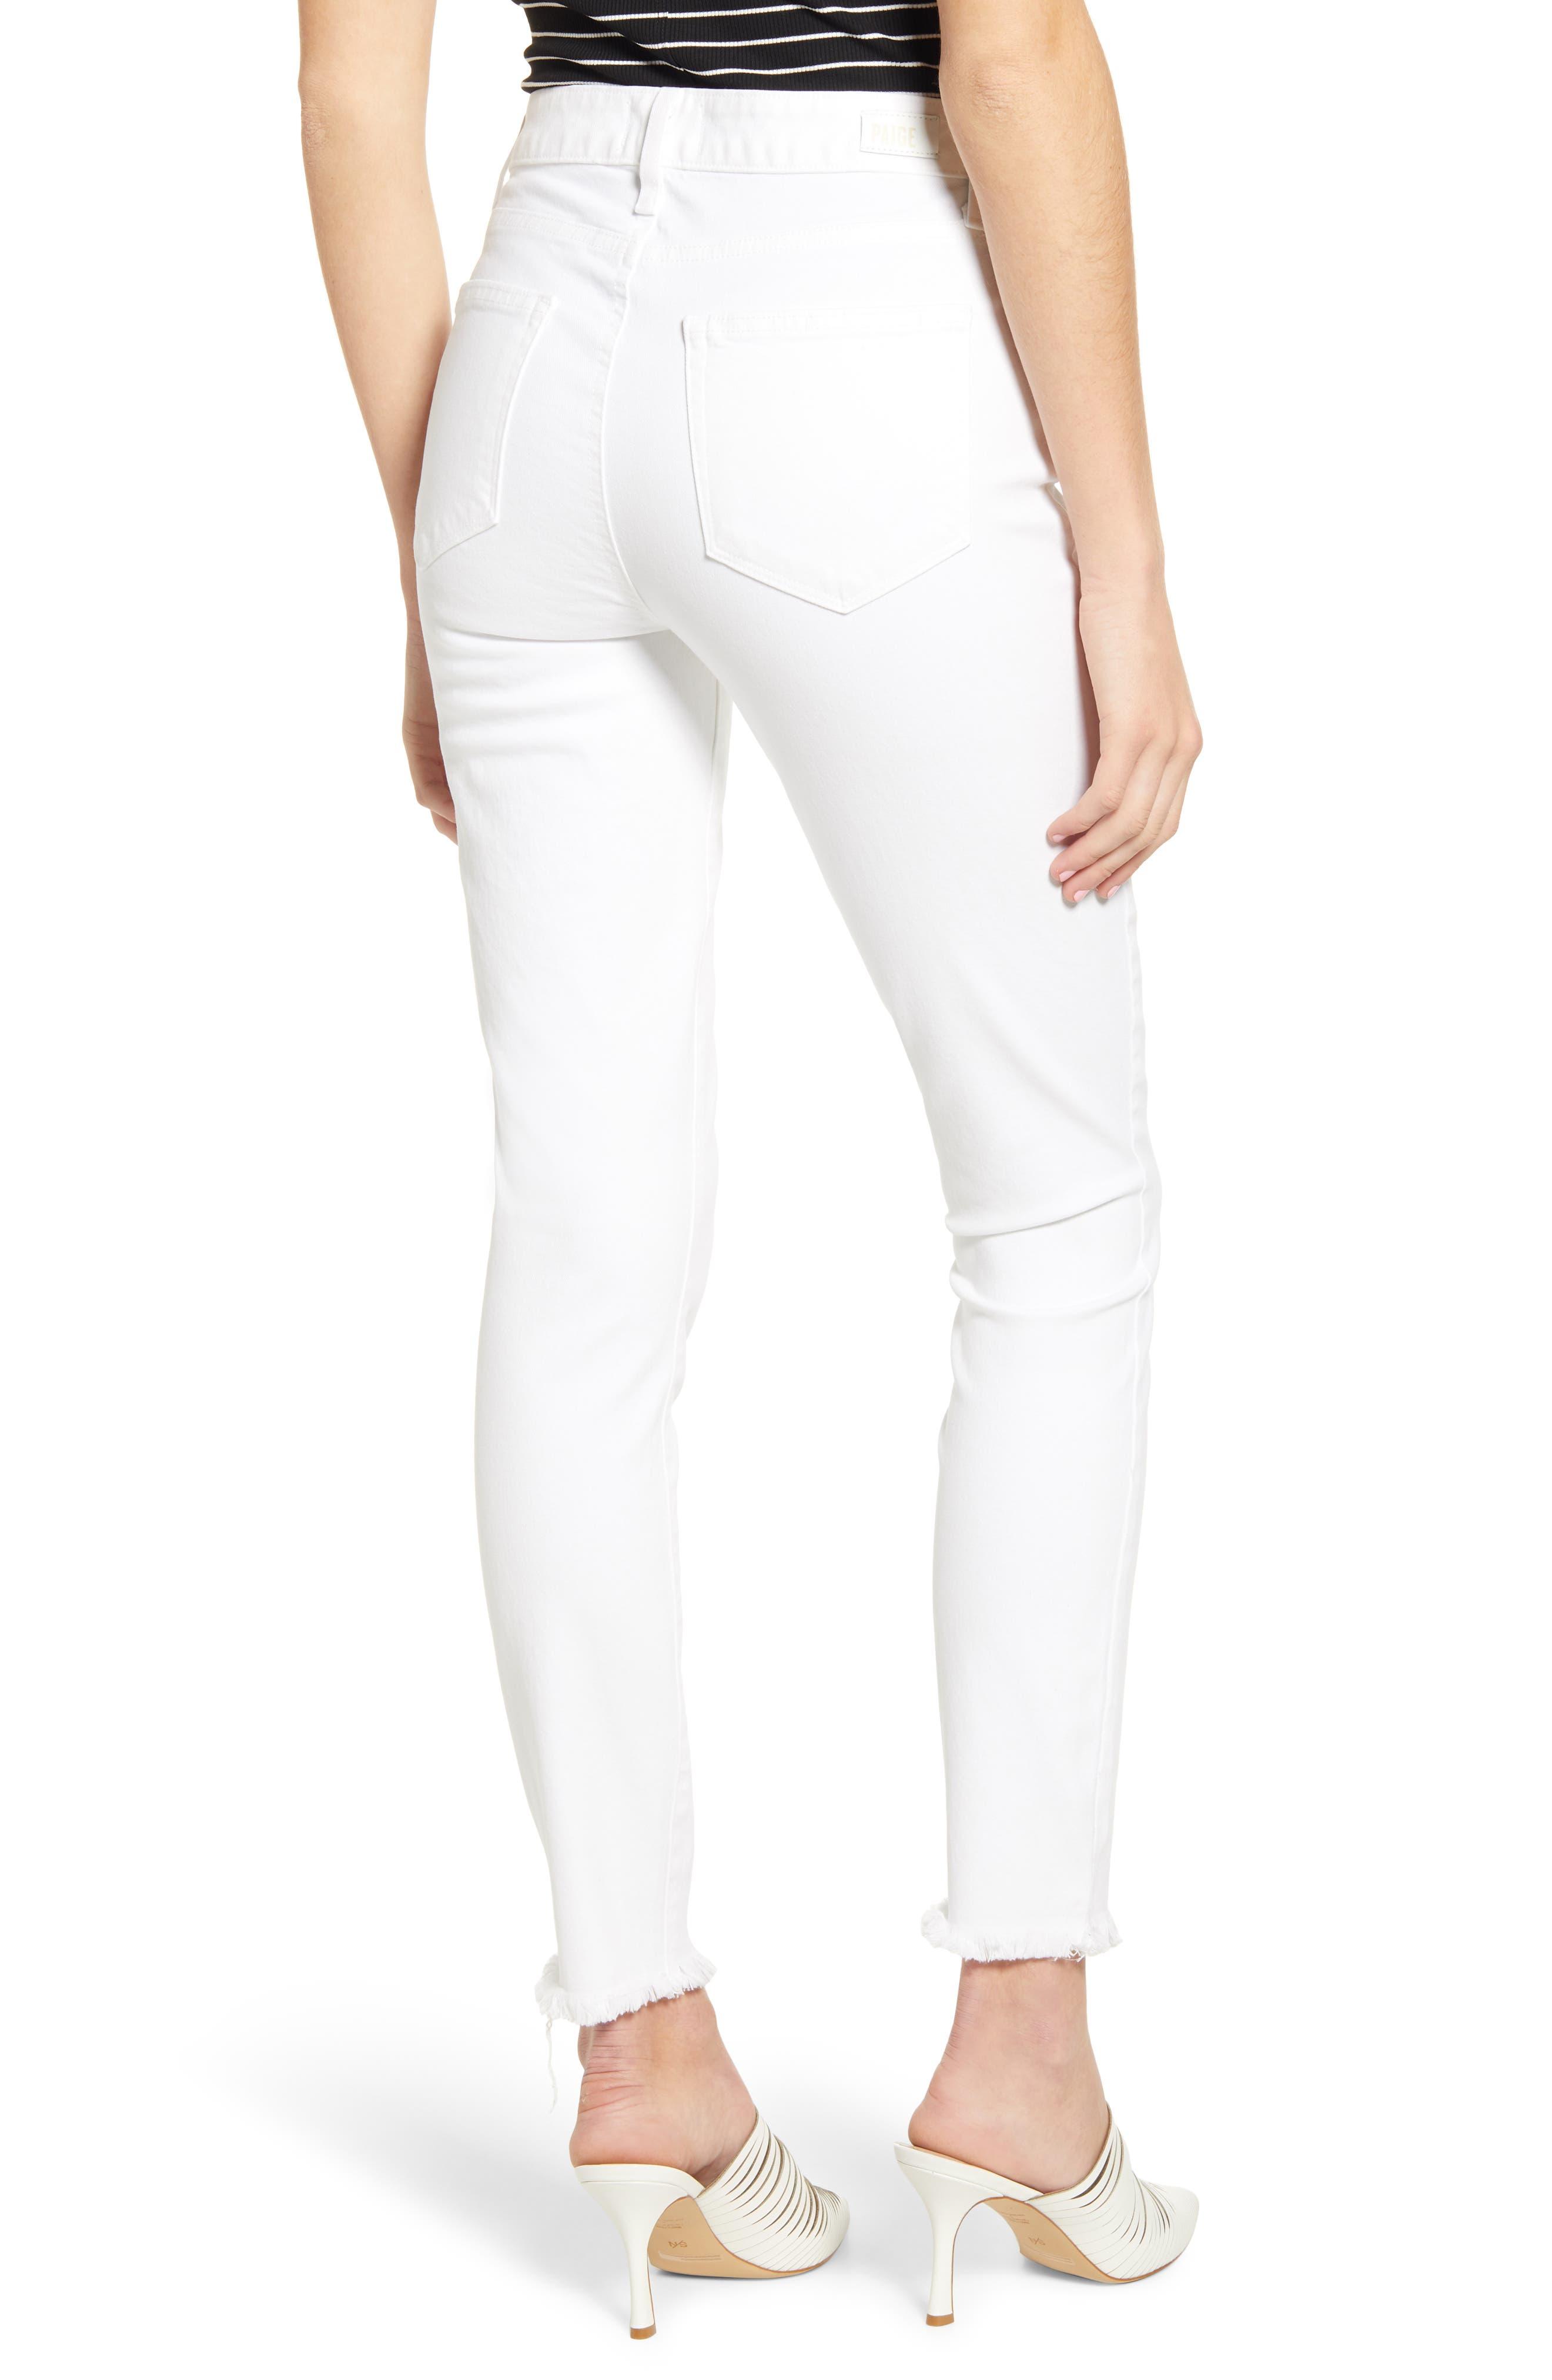 PAIGE, Hoxton High Waist Ankle Skinny Jeans, Alternate thumbnail 2, color, CRISP WHITE